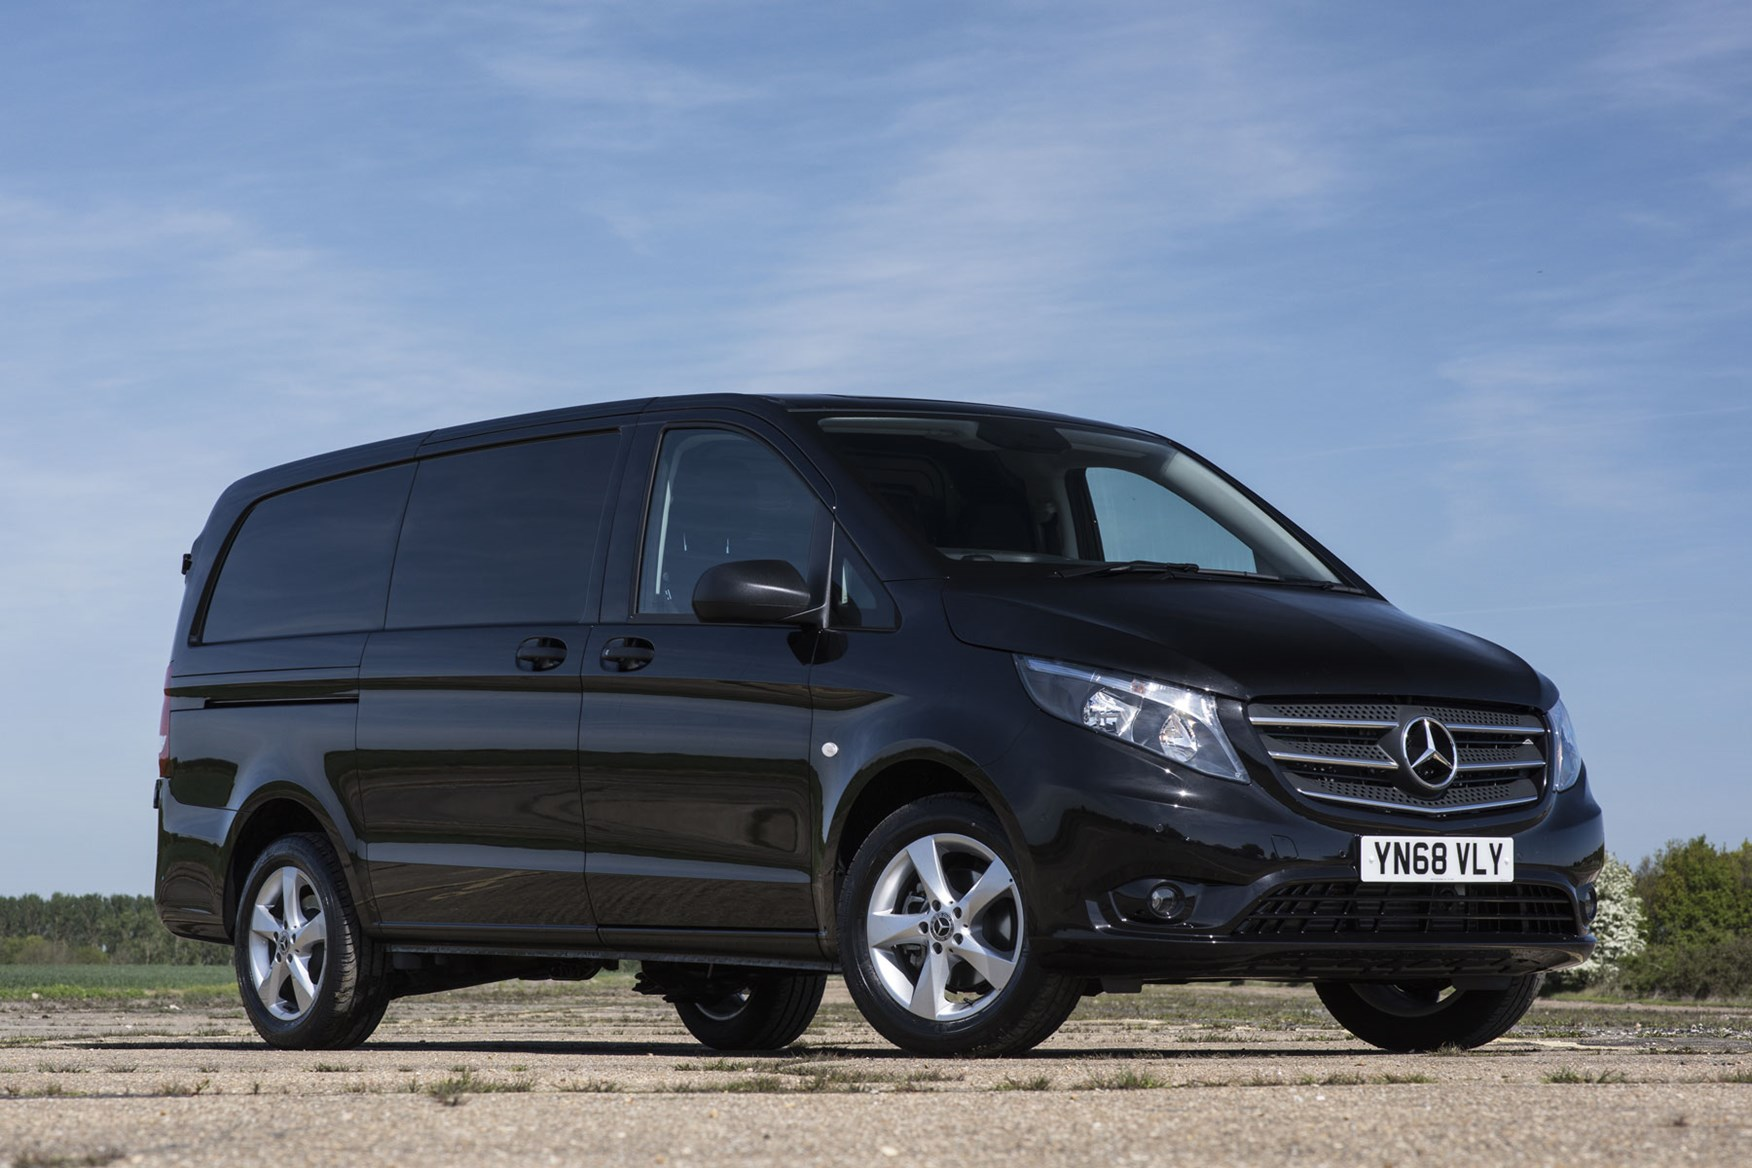 2019 Mercedes-Benz Vito Premium - black, front view